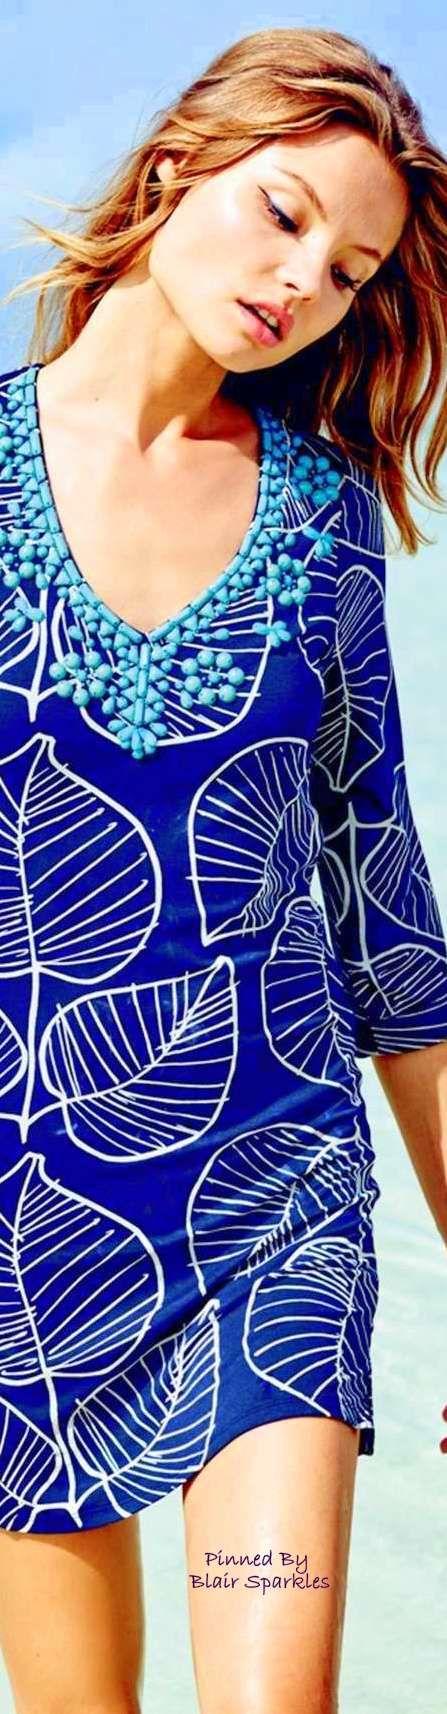 Magdalena frackowiak Boden Collection 2015 ♕♚εїз | BLAIR SPARKLES |